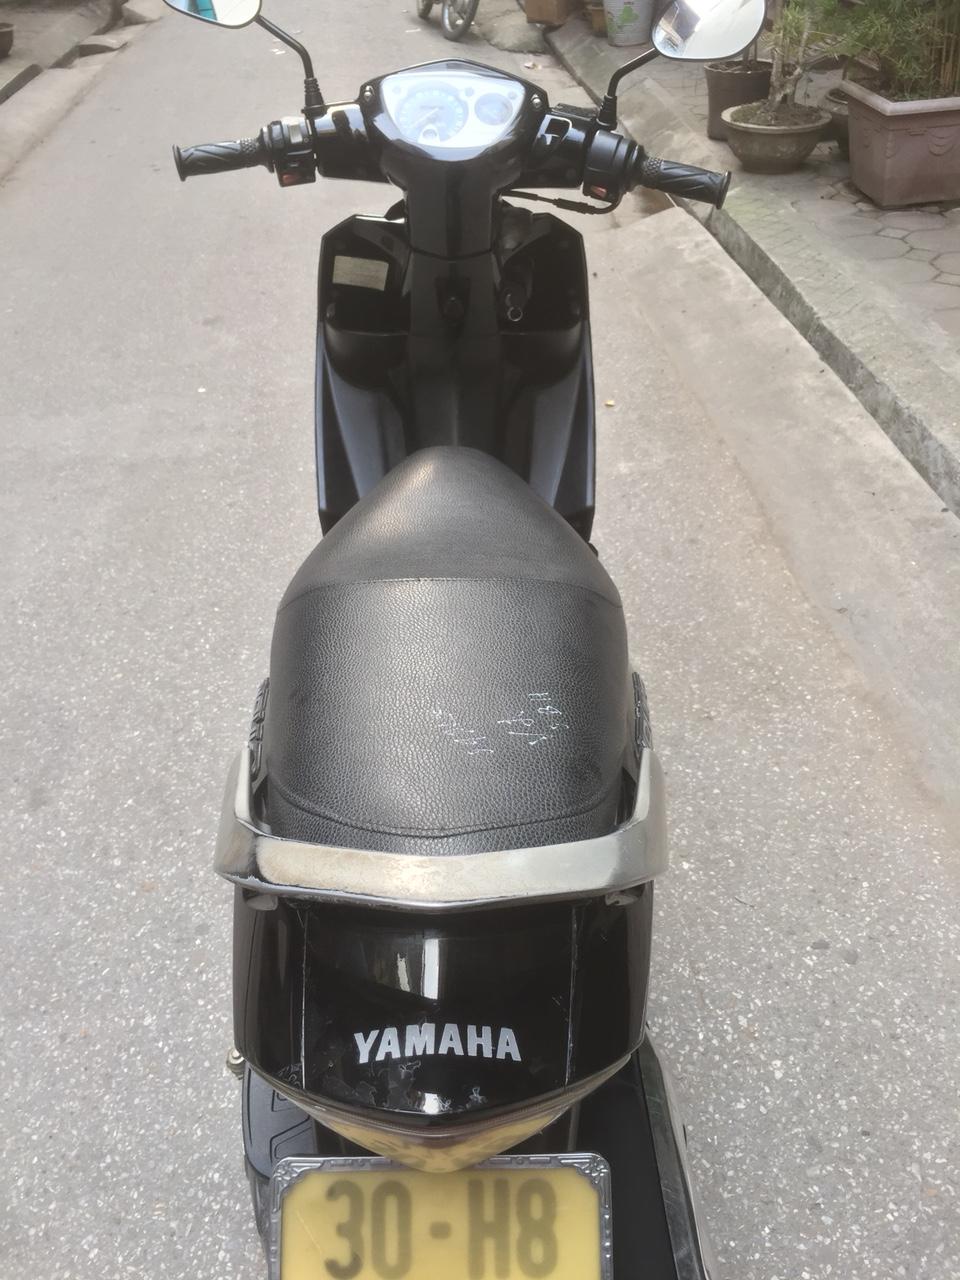 Ban Yamaha Nouvo 2010 1 pha ban cuoi may cuc chat nguyen ban bien Hn - 2